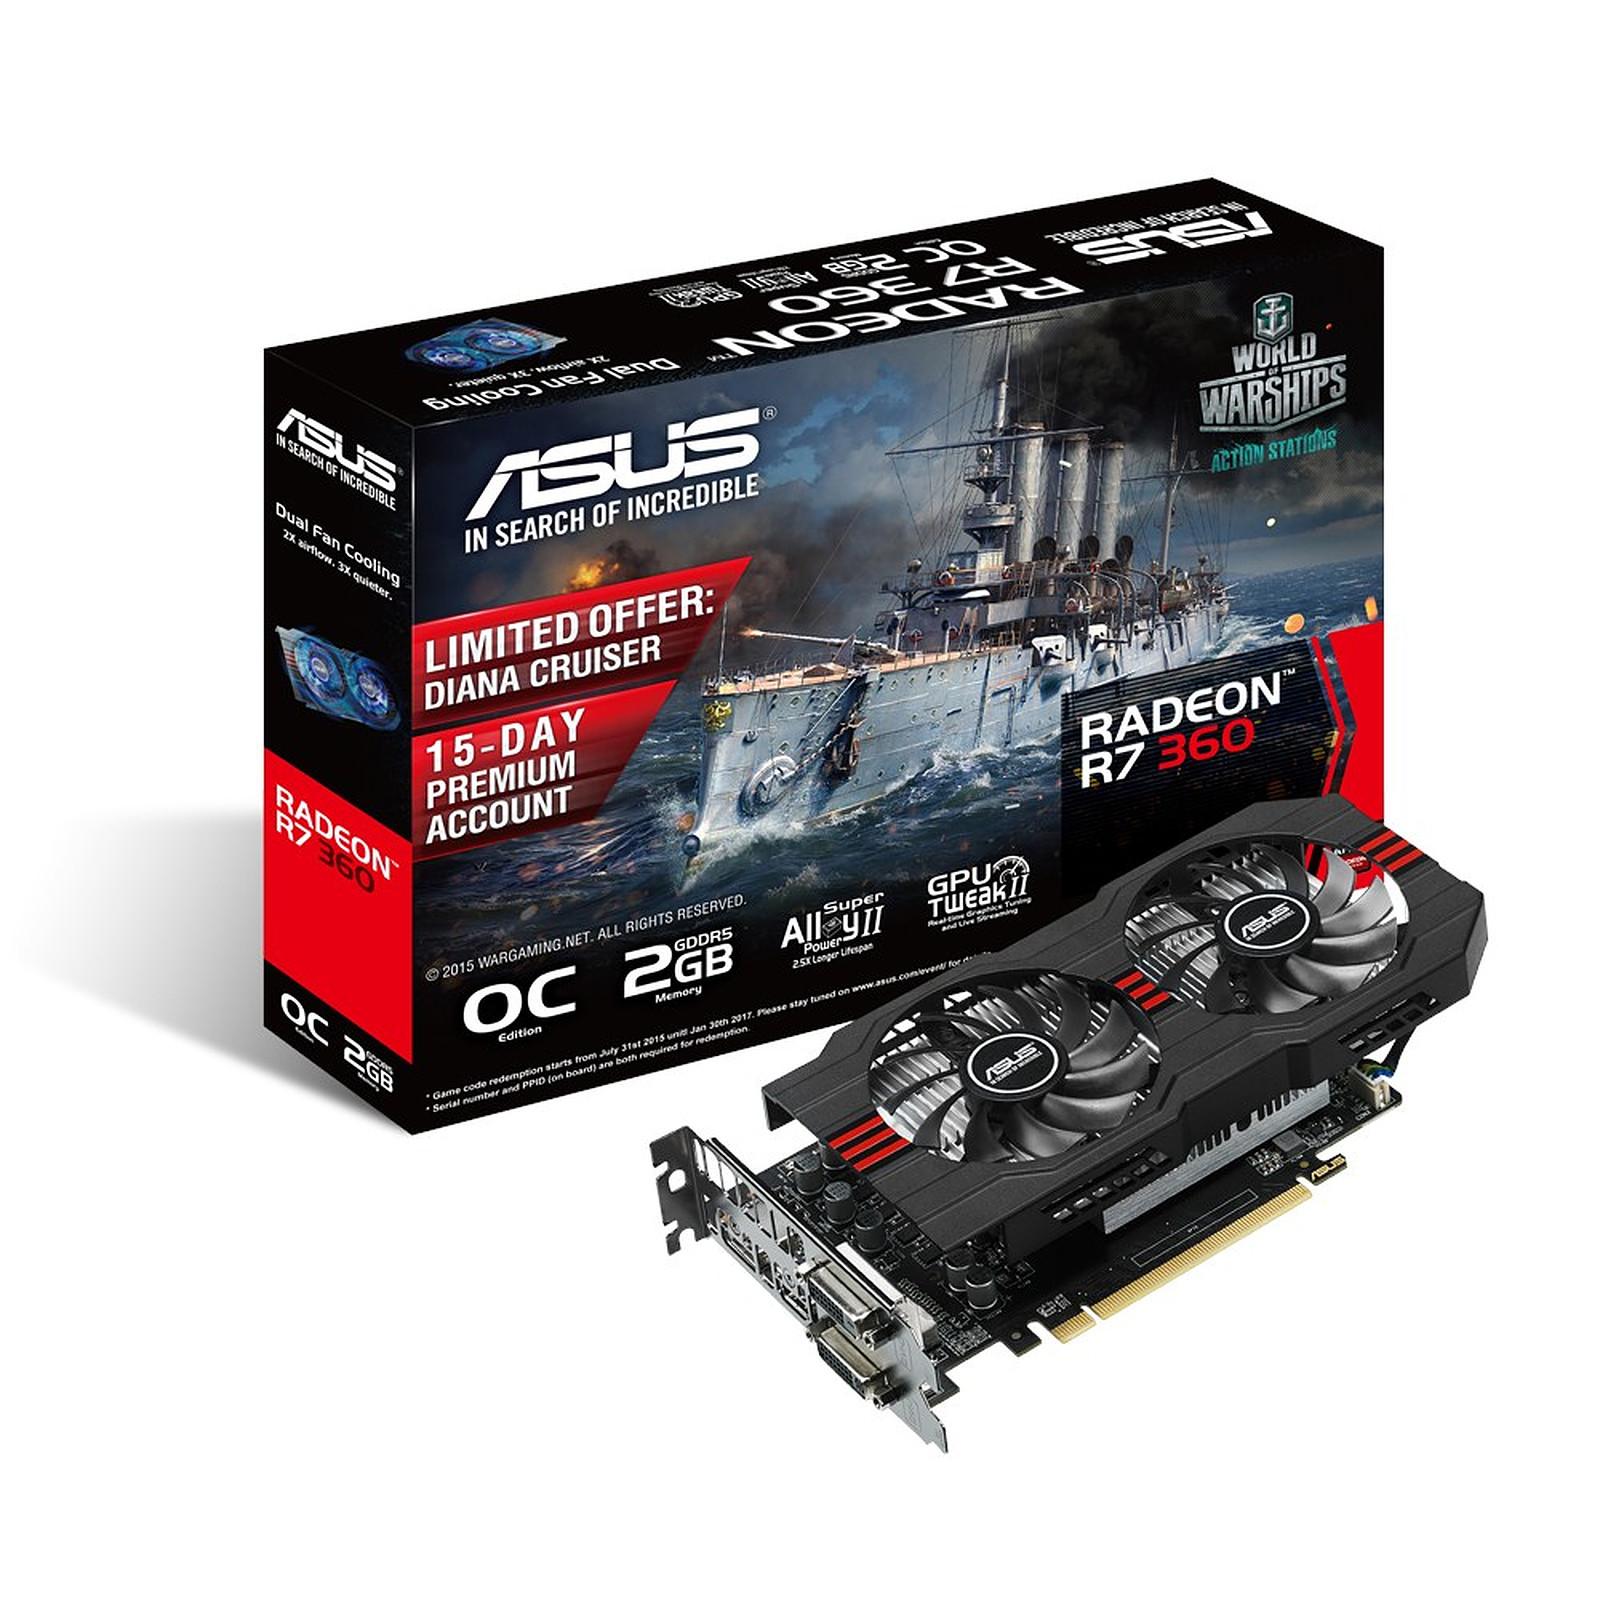 ASUS Radeon R7 360 R7360-OC-2GD5